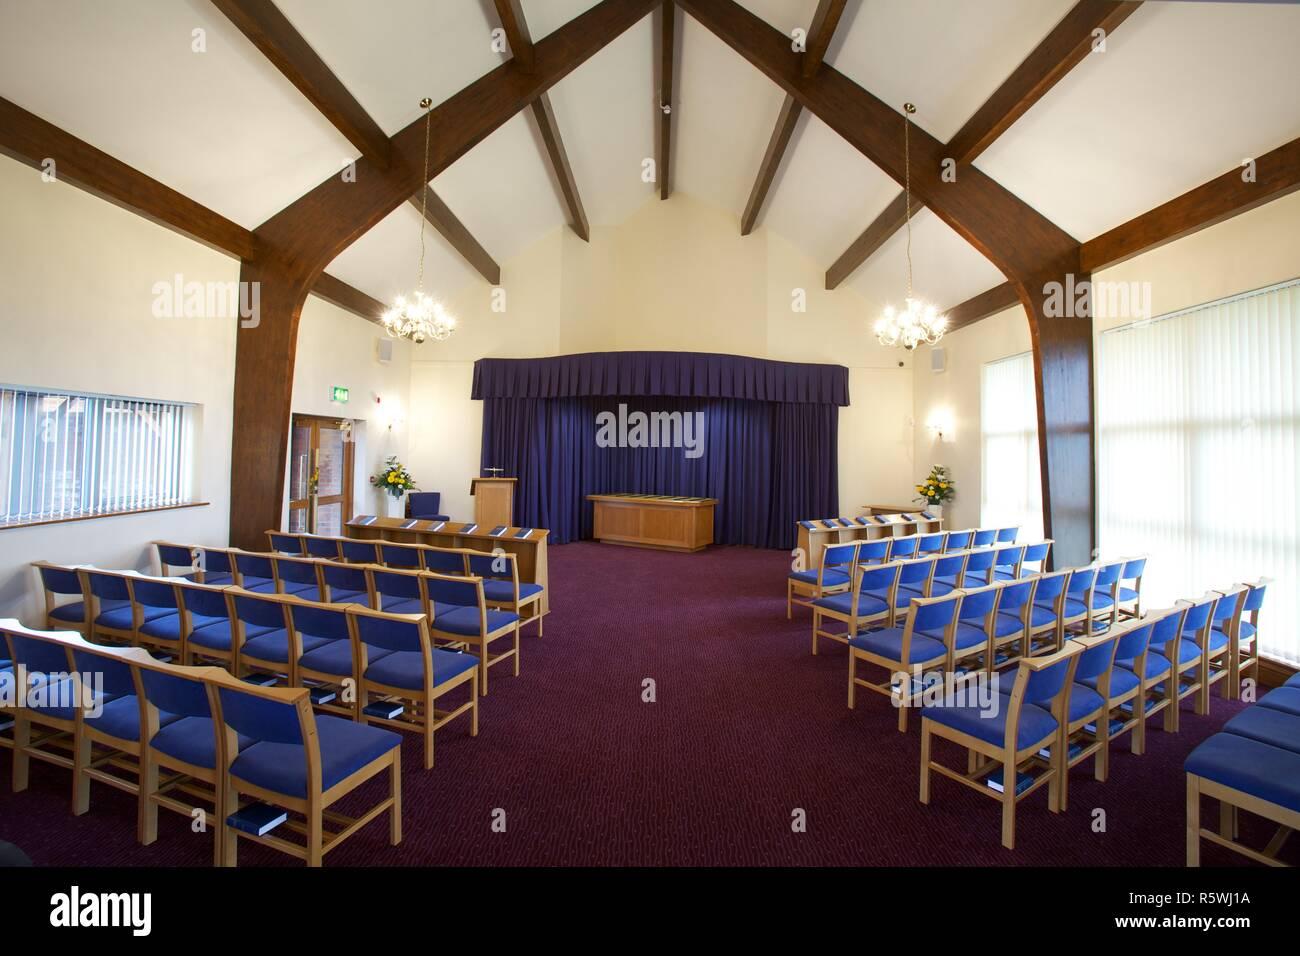 Funeral Chapel - Stock Image